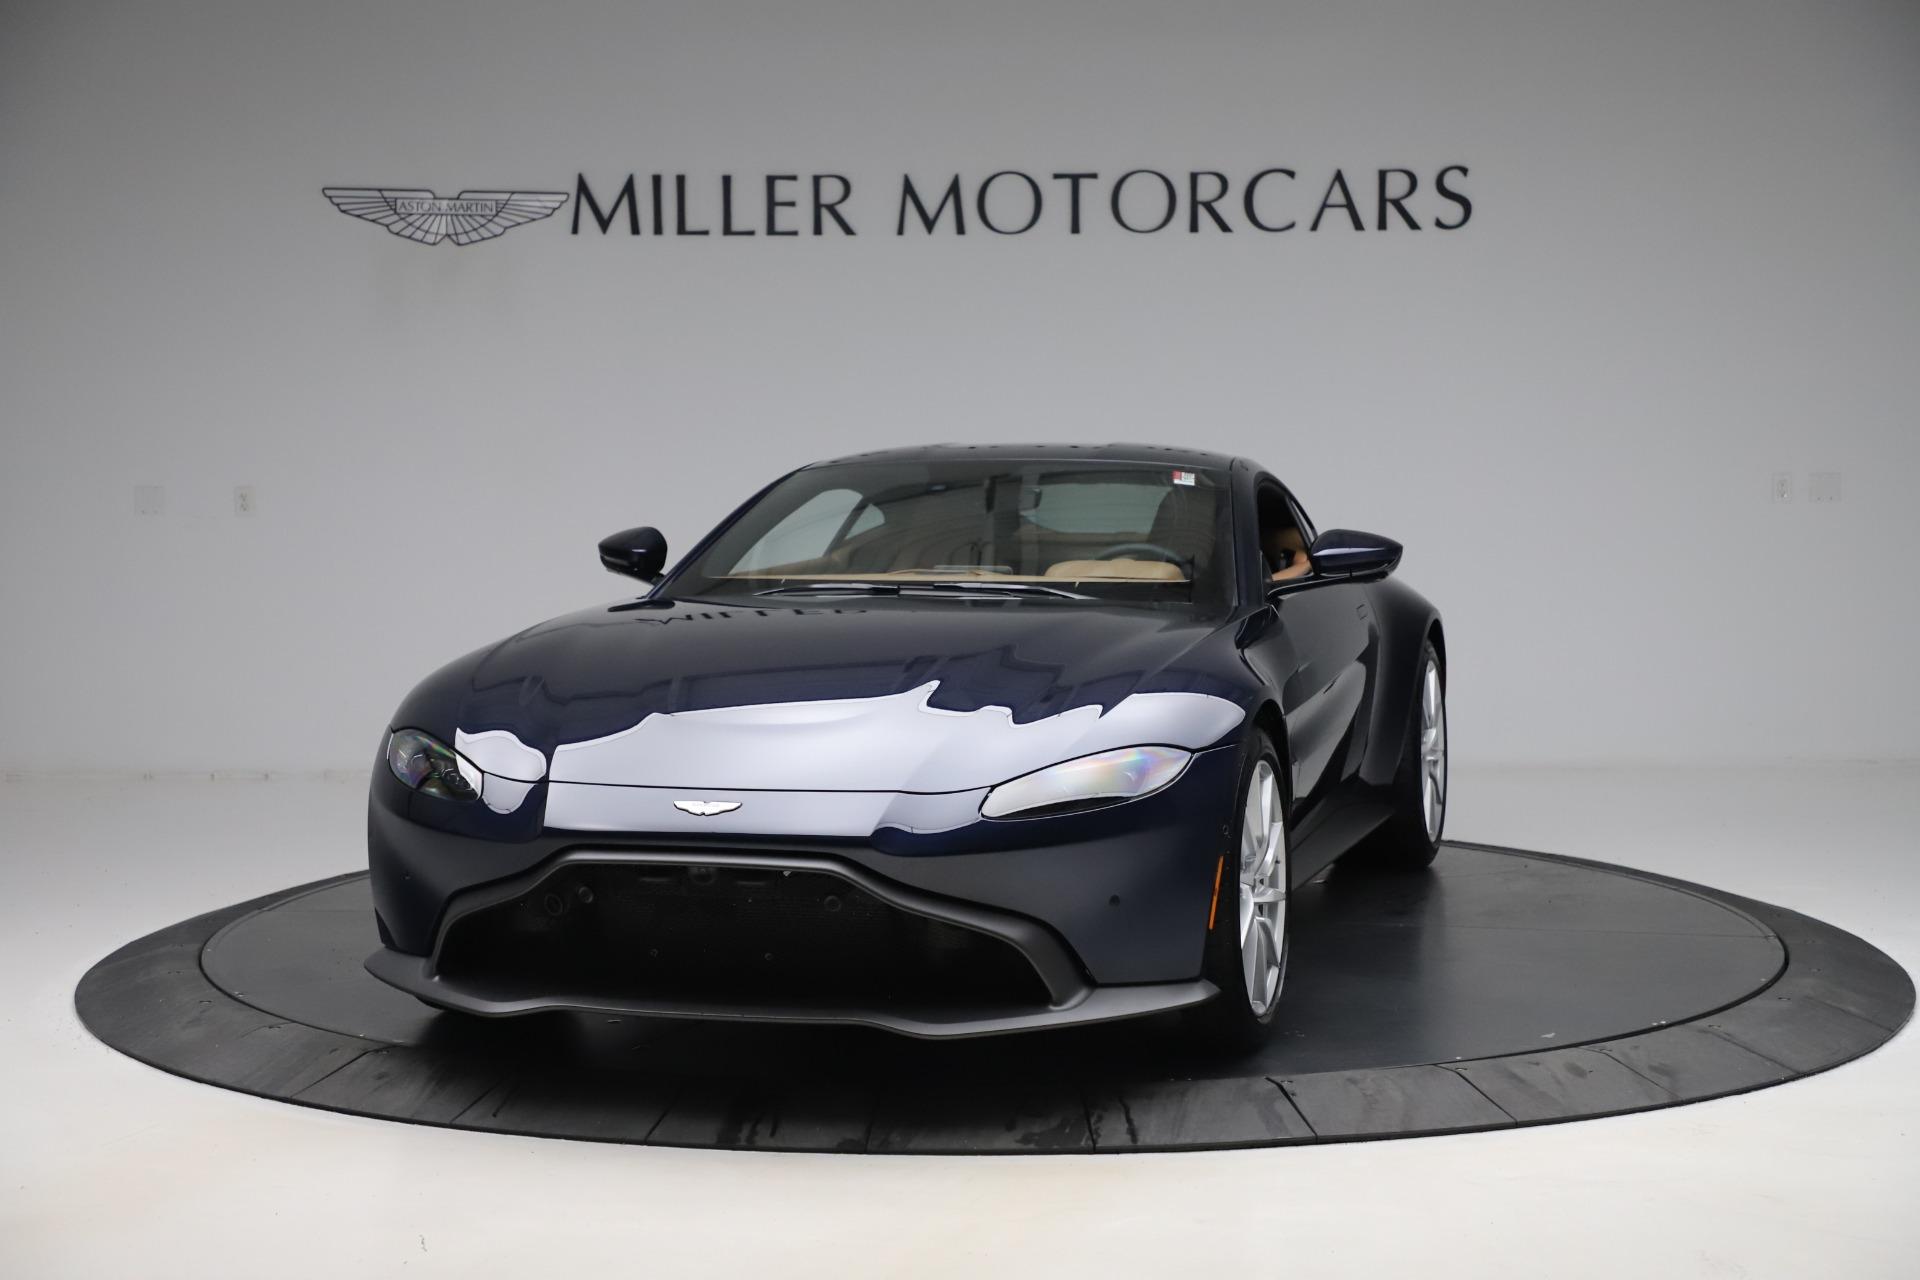 New 2020 Aston Martin Vantage Coupe for sale $174,731 at Bugatti of Greenwich in Greenwich CT 06830 1